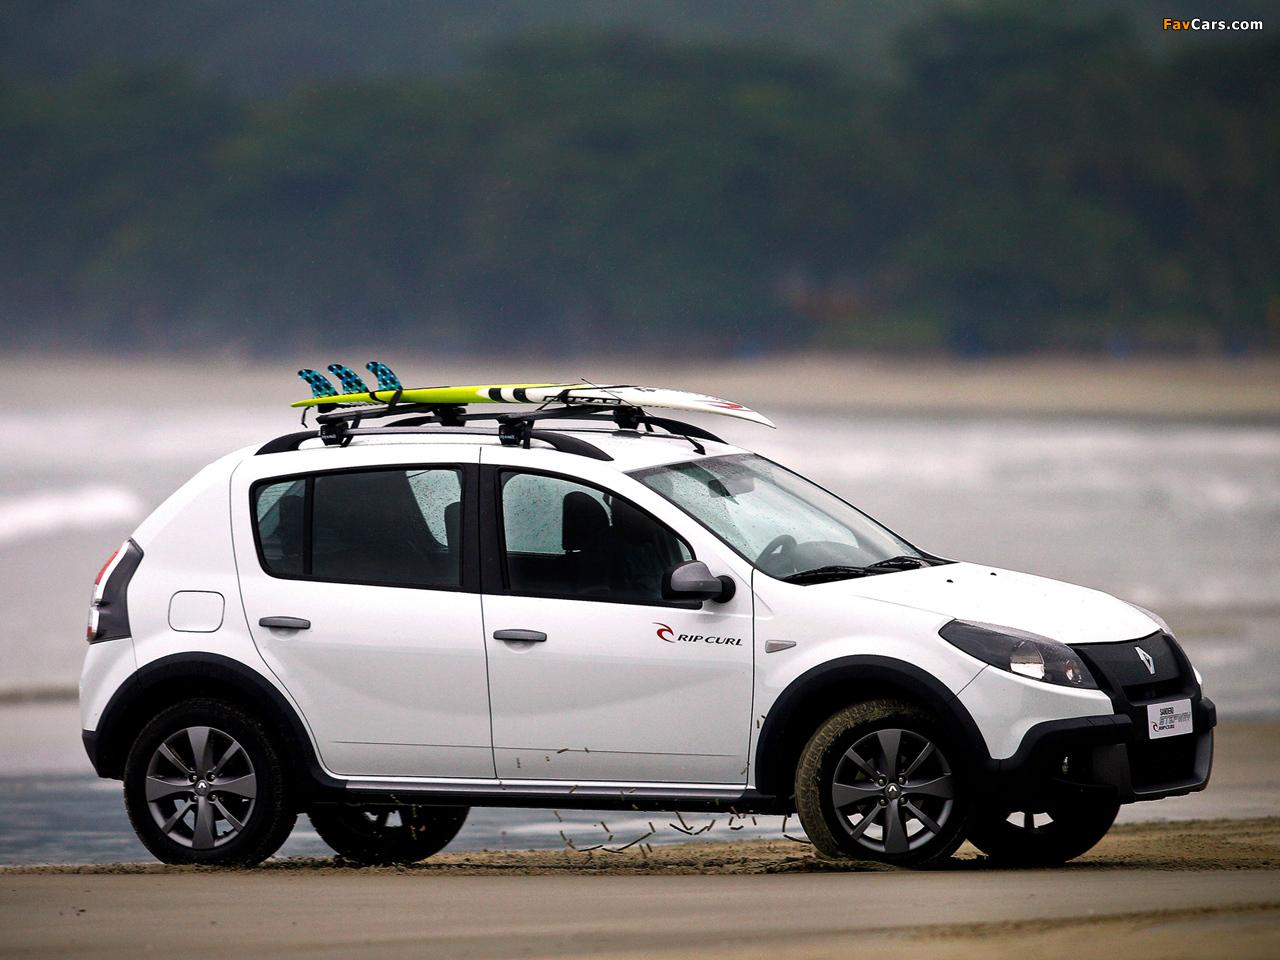 Renault Sandero Stepway Rip Curl 2012 images (1280 x 960)